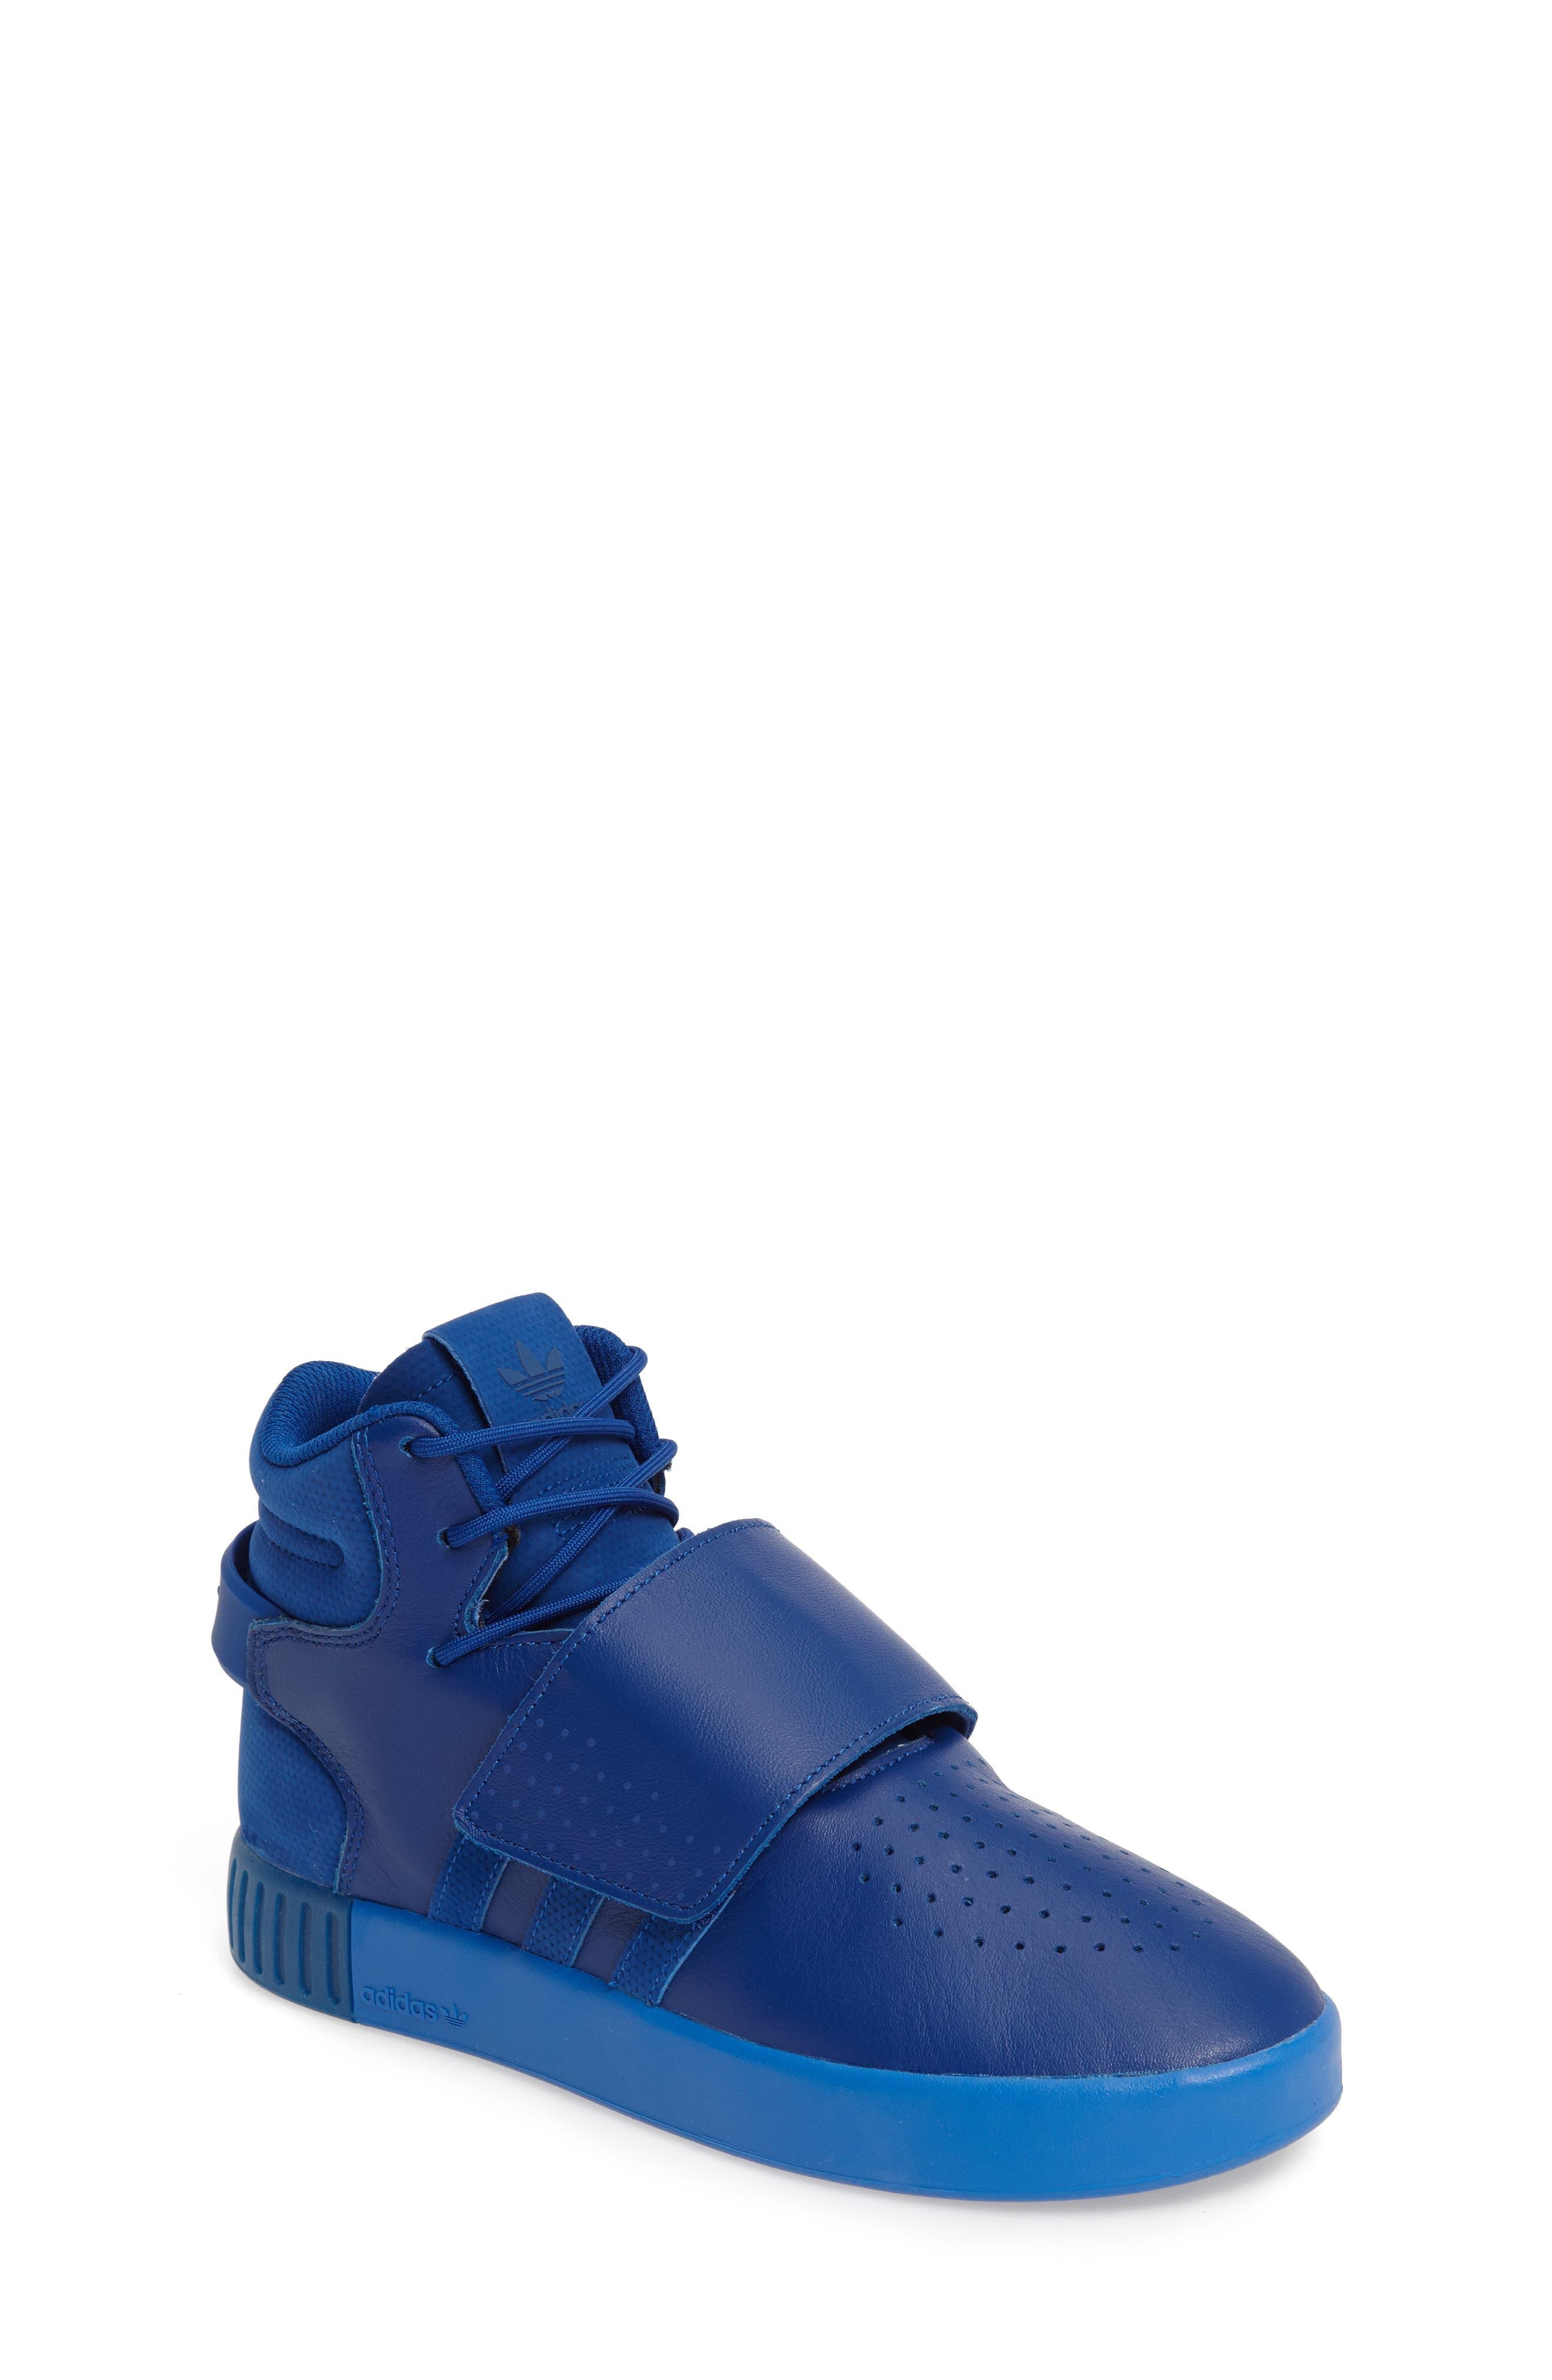 ADIDAS Tubular Invader Sneaker